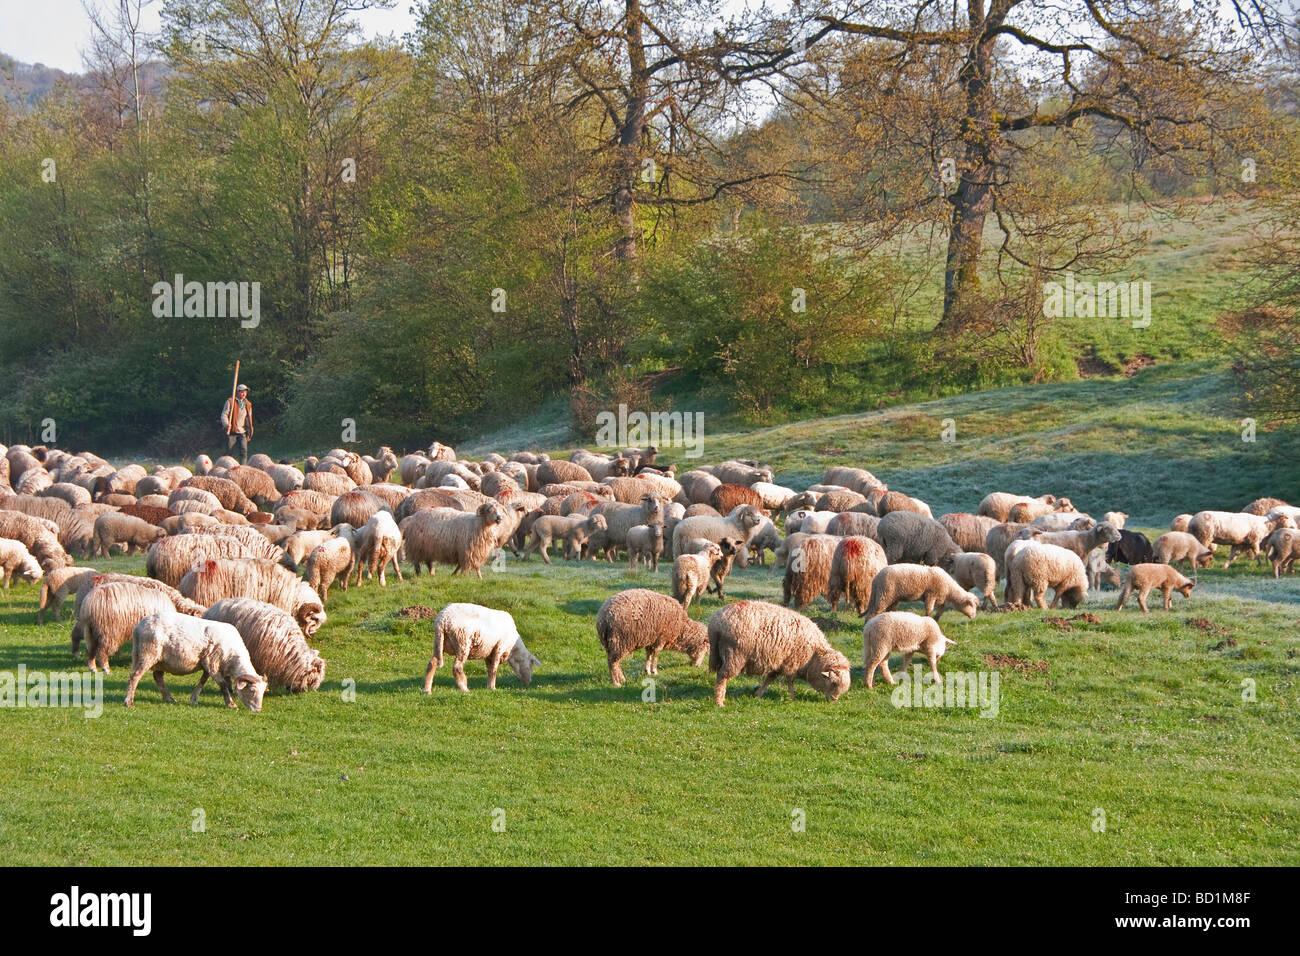 Romanian shepherd with flock in Tranyslvania coutryside near Bran - Stock Image